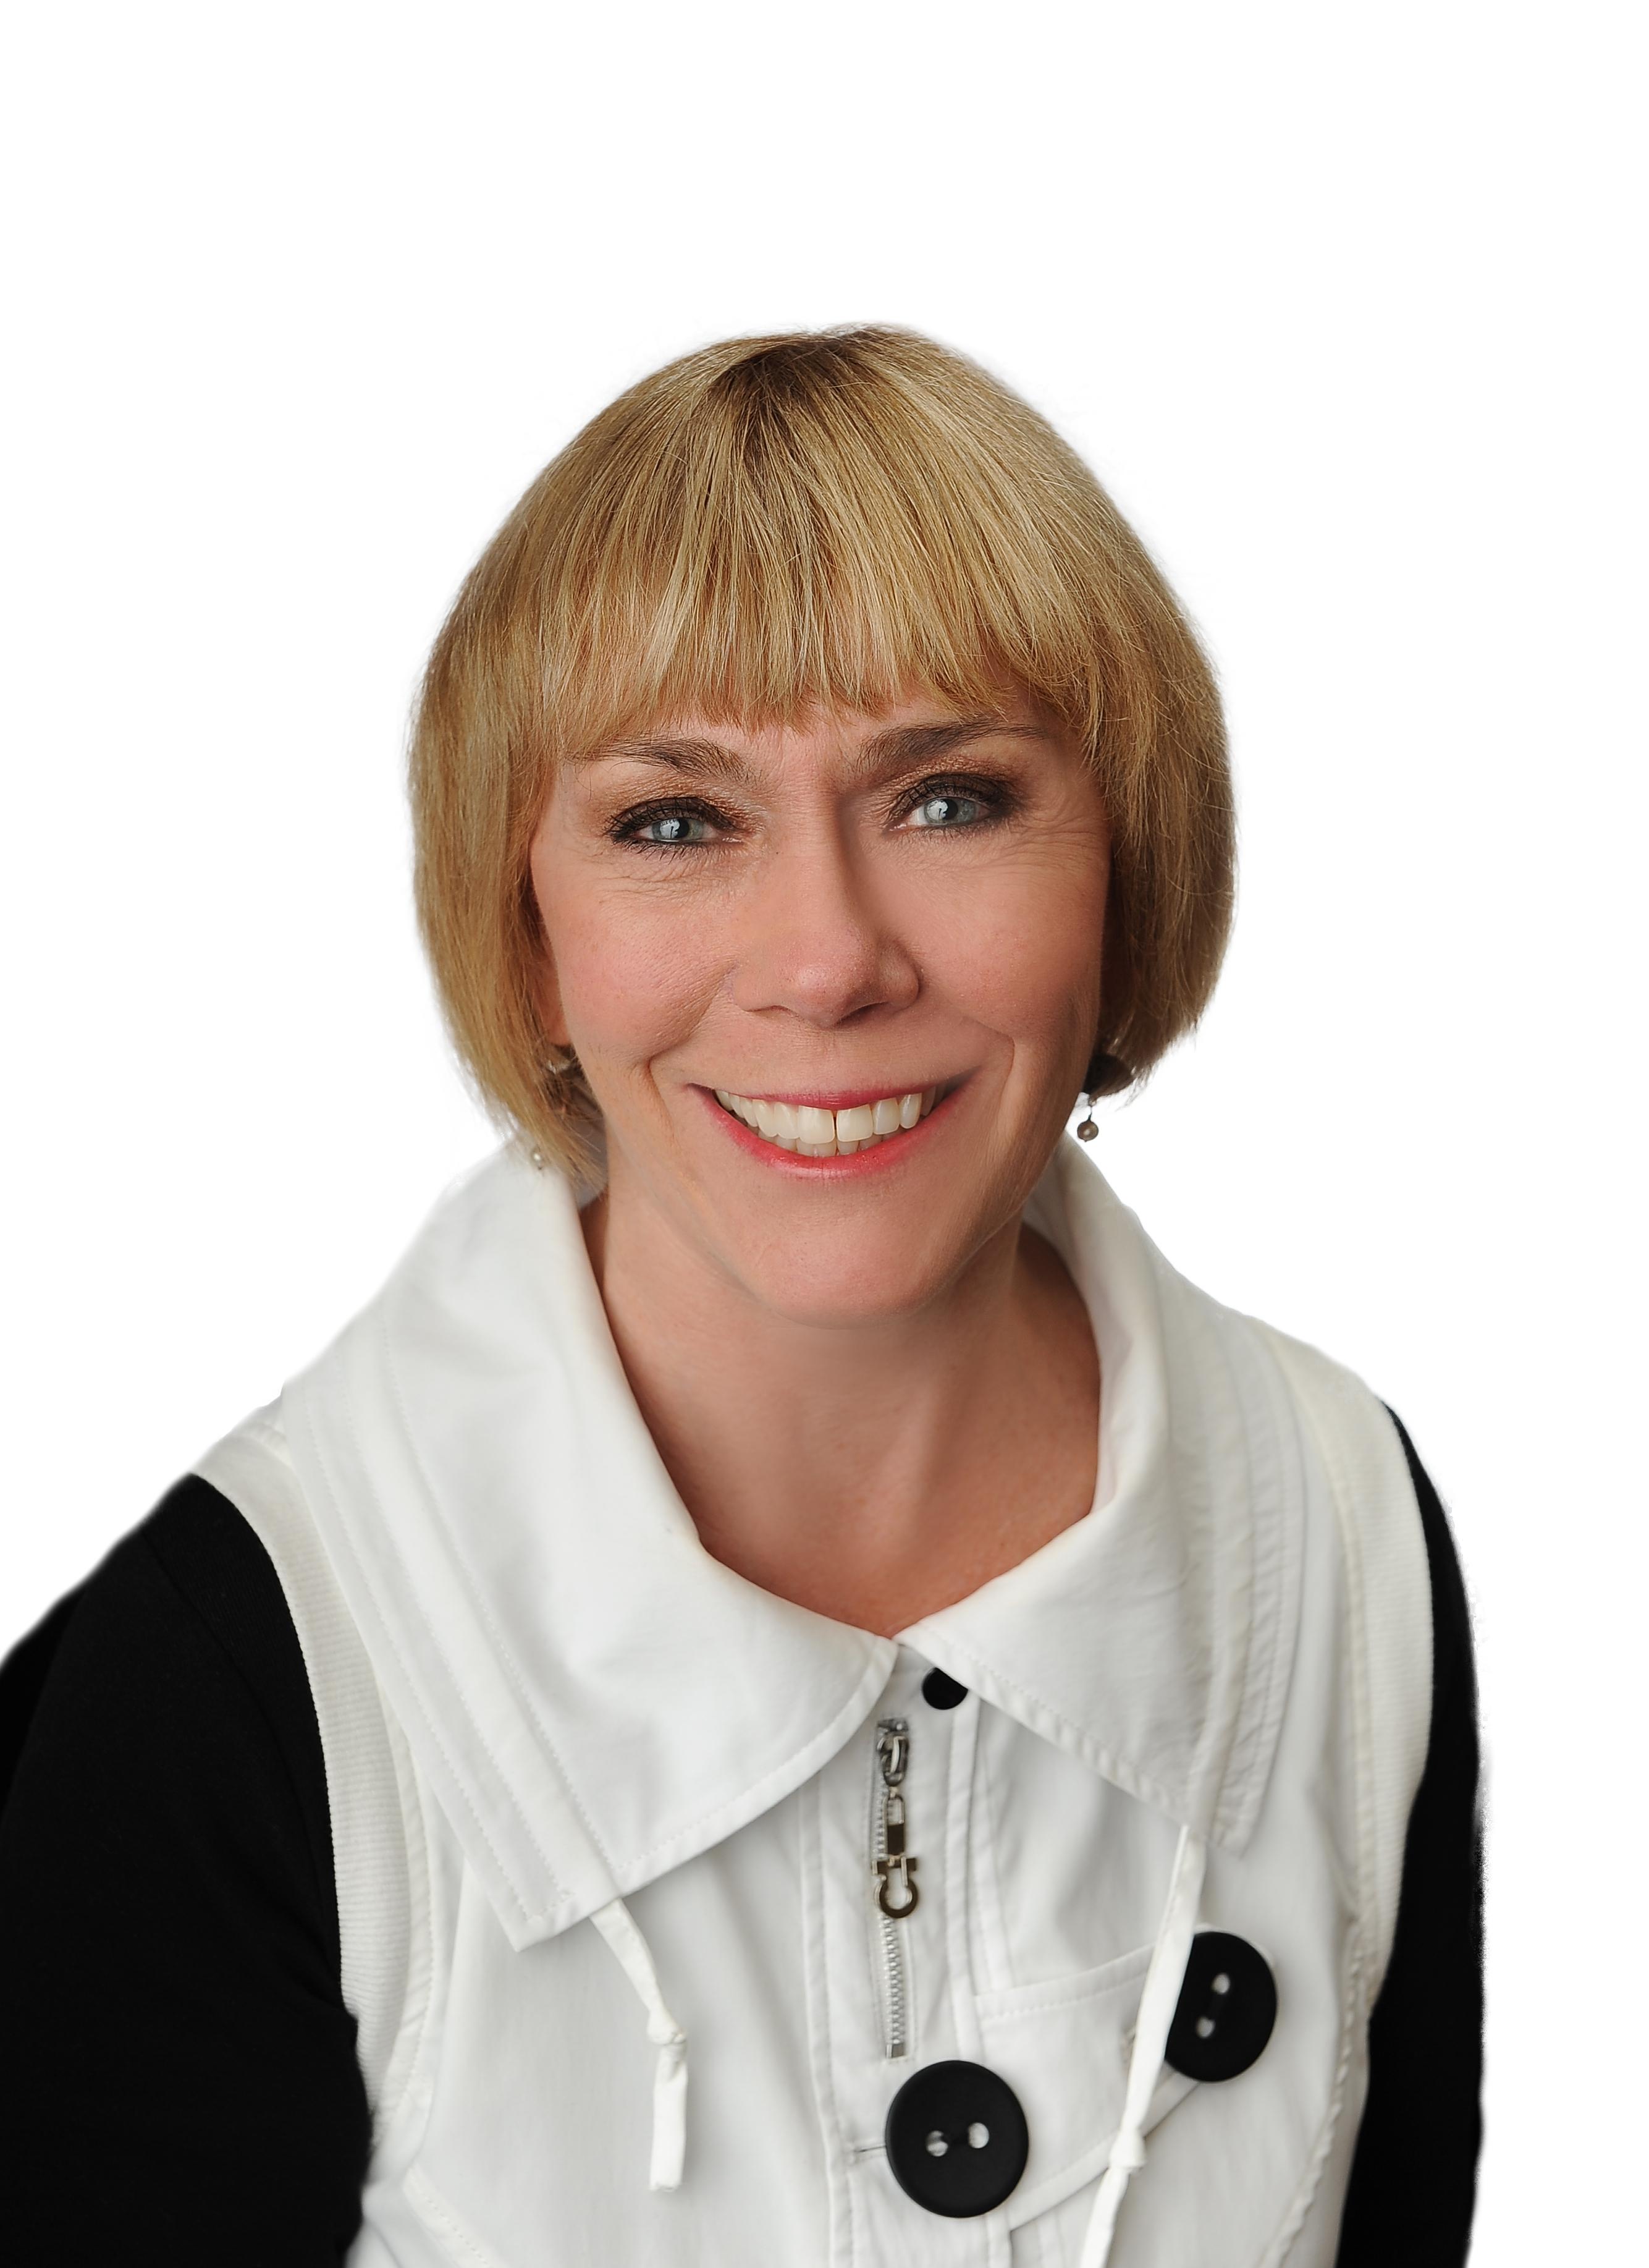 Gayle Pietras